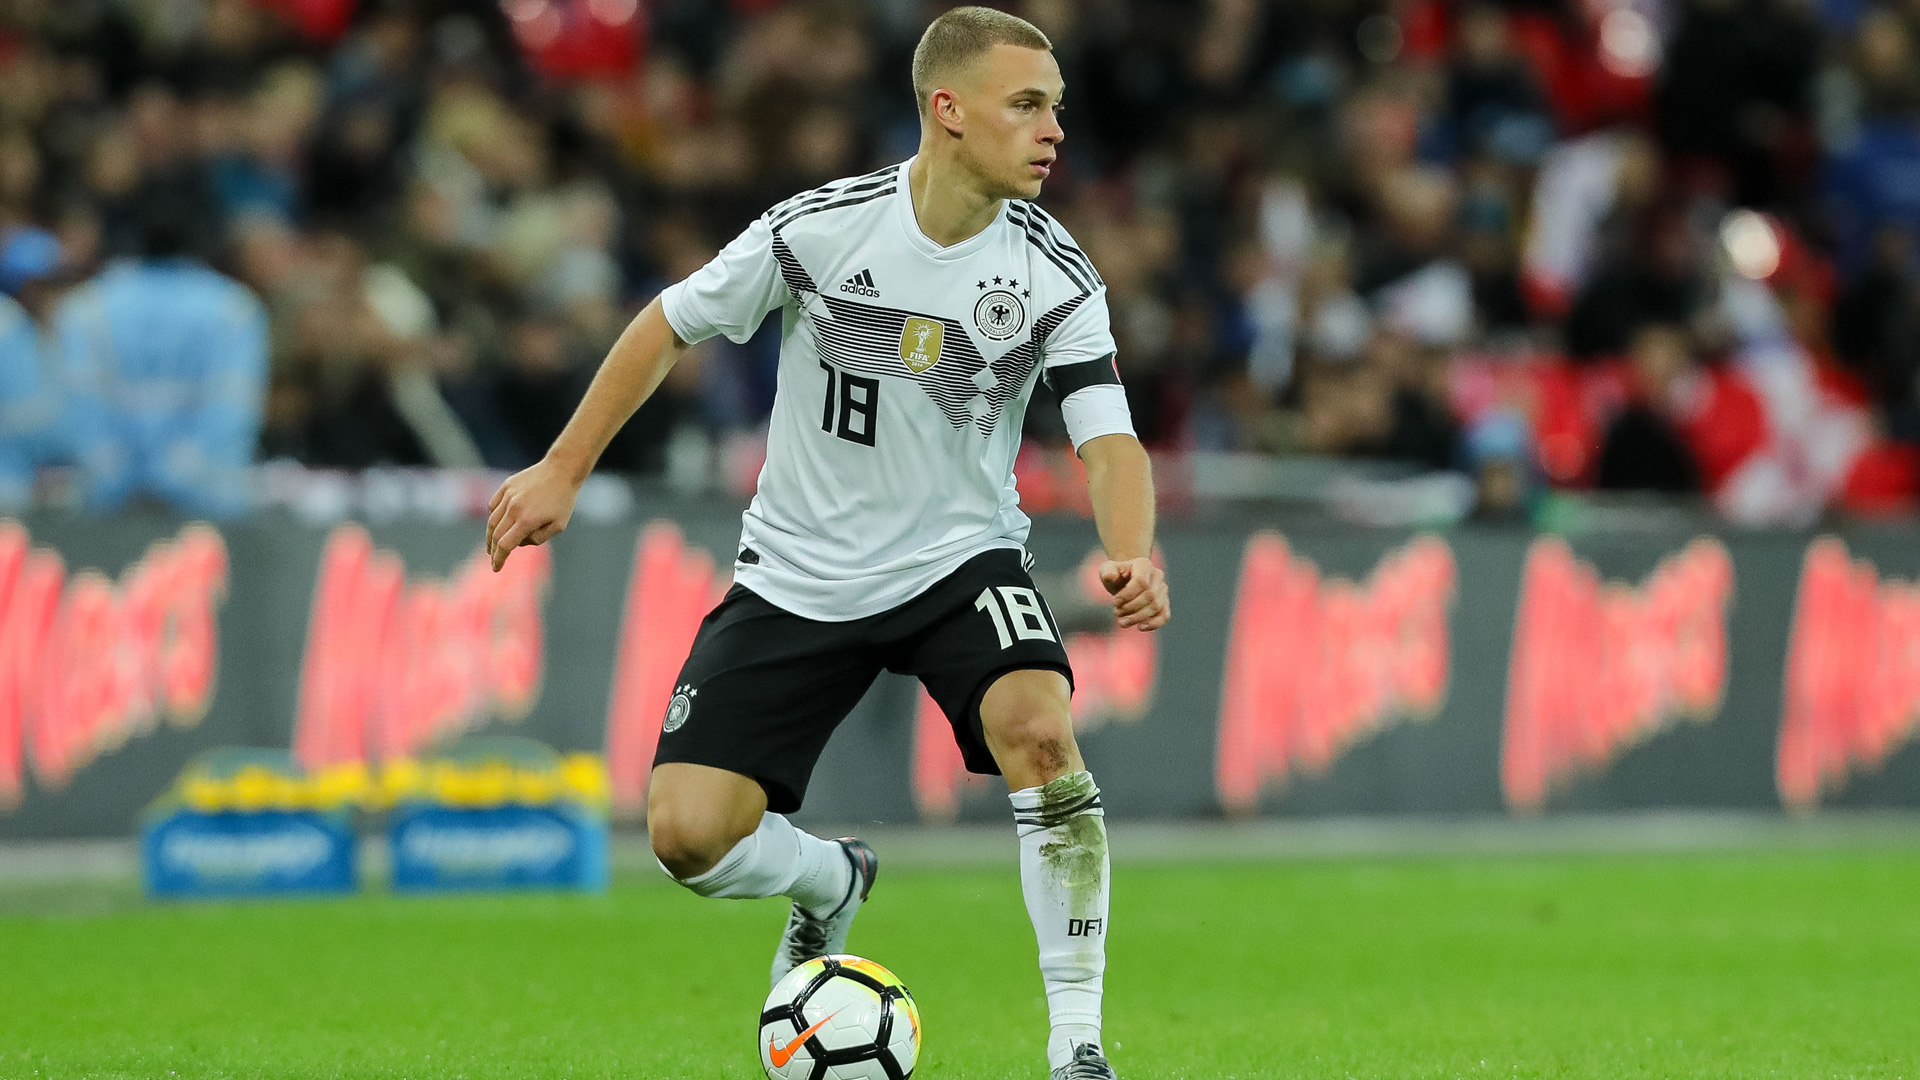 Joshua Kimmich DFB Germany 2018